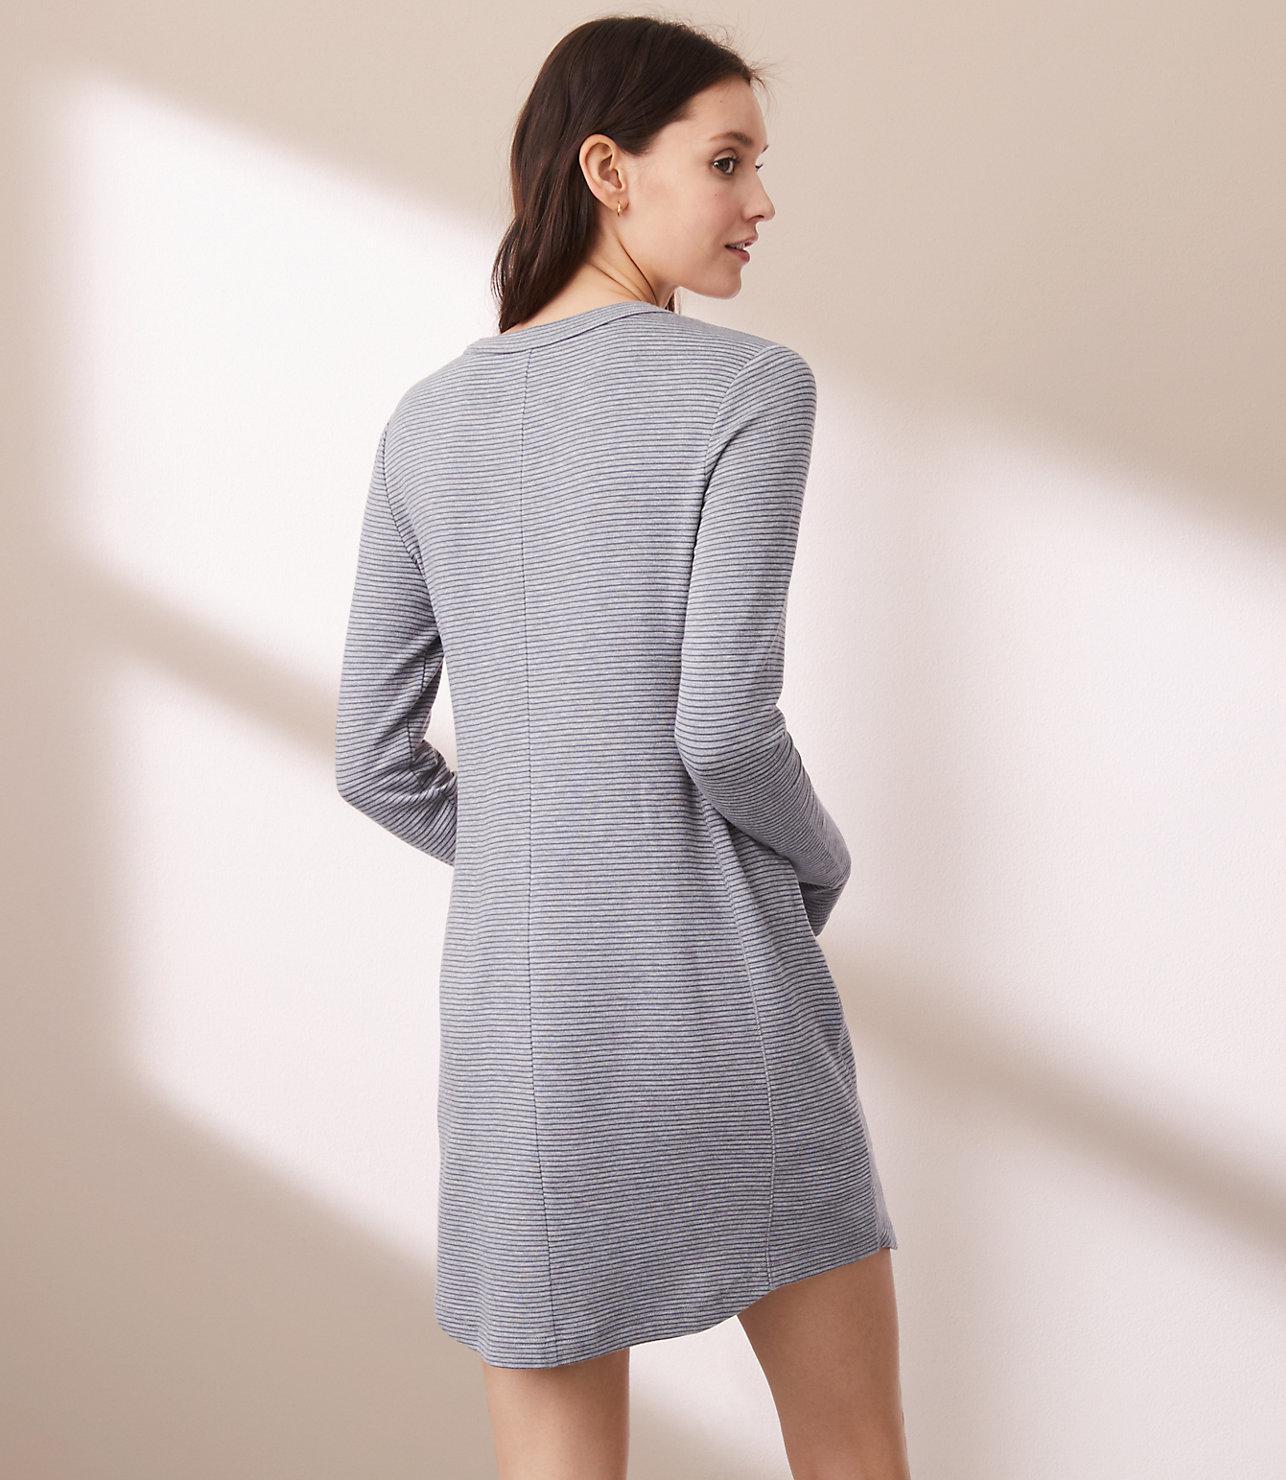 ac9219b1d2ae Lyst - Lou   Grey Striped Signaturesoft Dress in Gray